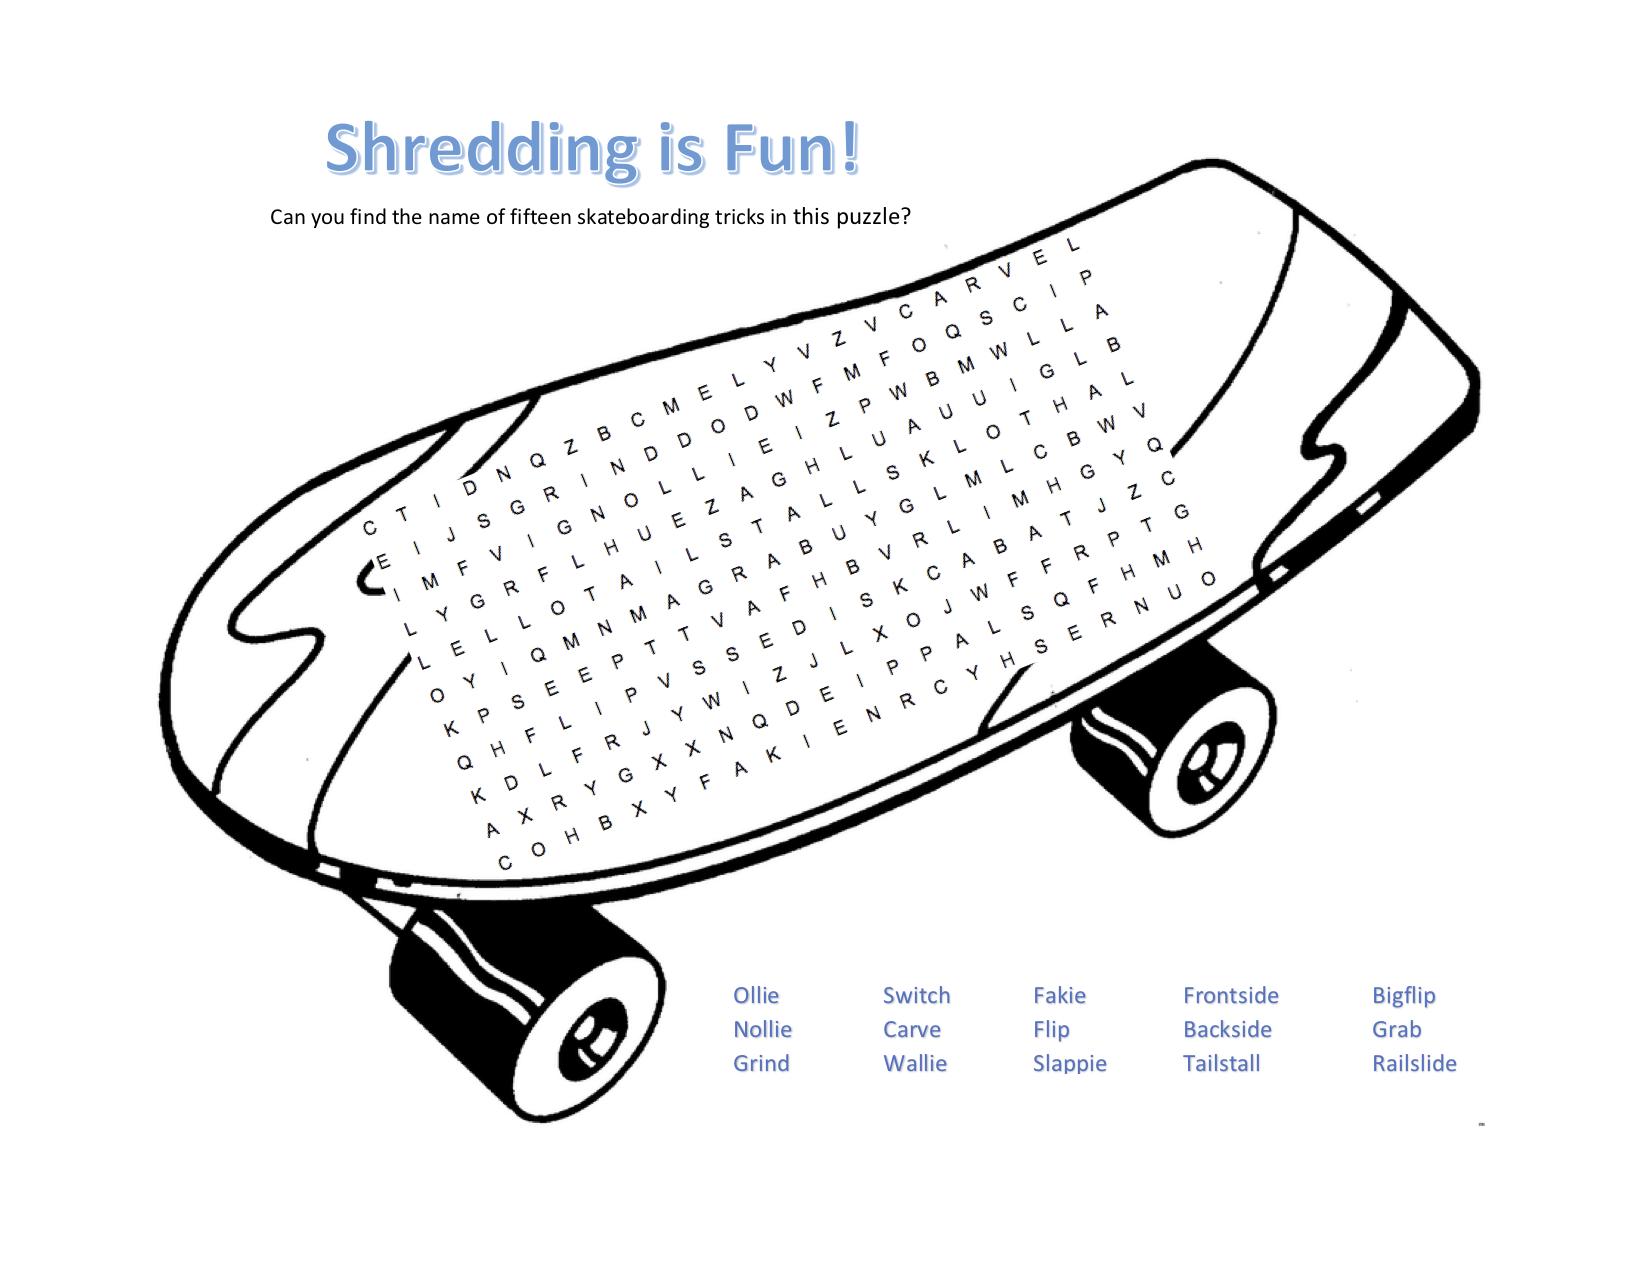 celebrate-picture-books-Shredding-is-Fun-Skateboarding-Word-Search